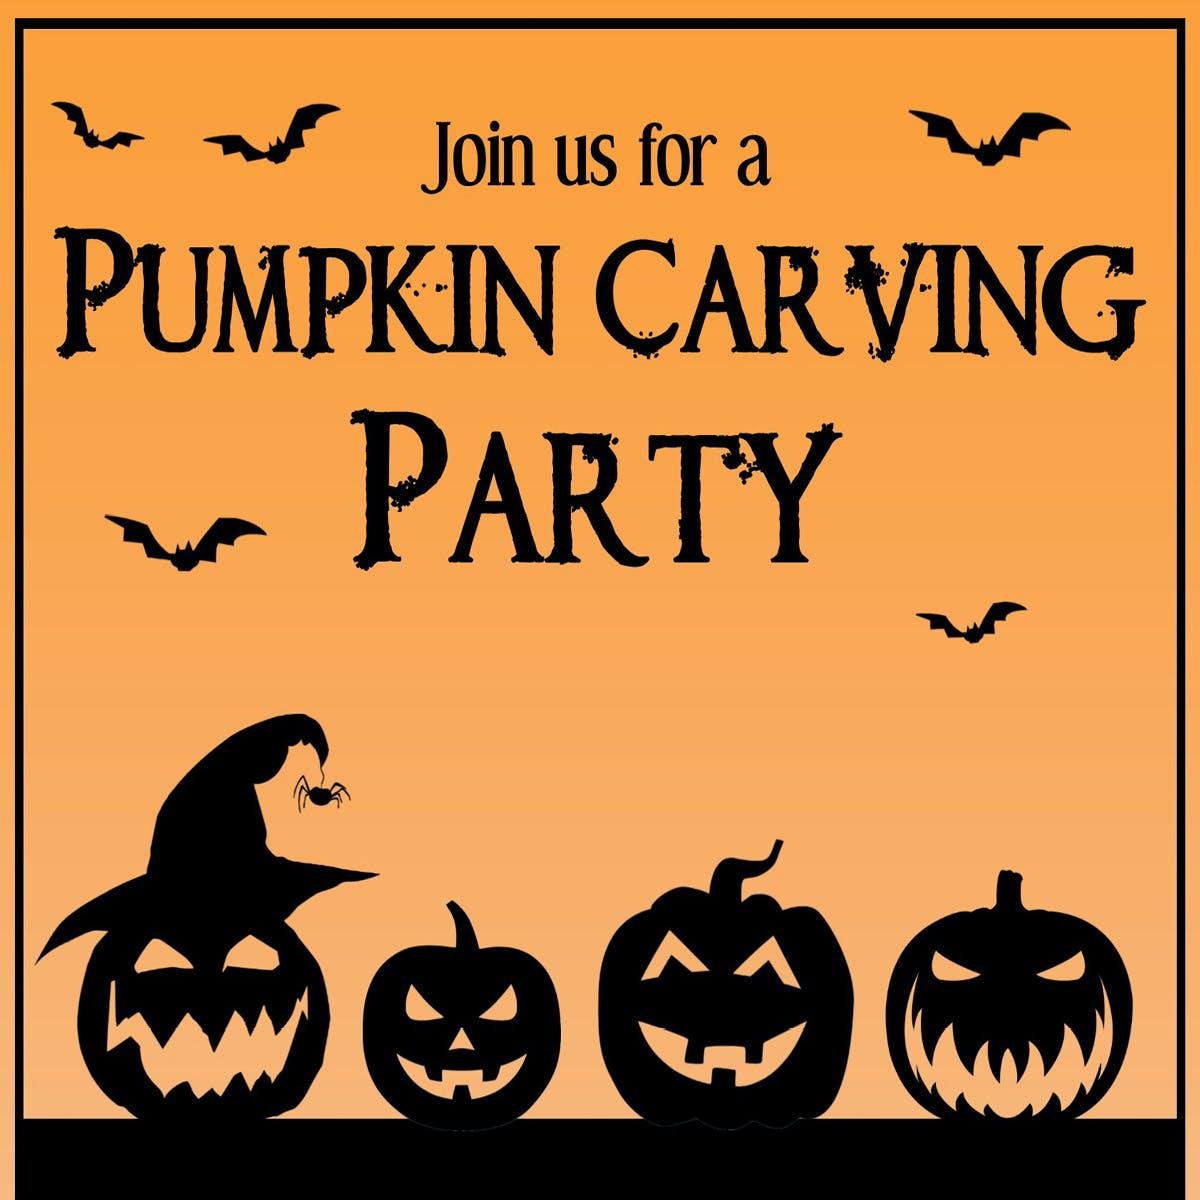 Pumpkin Carving Party 2021